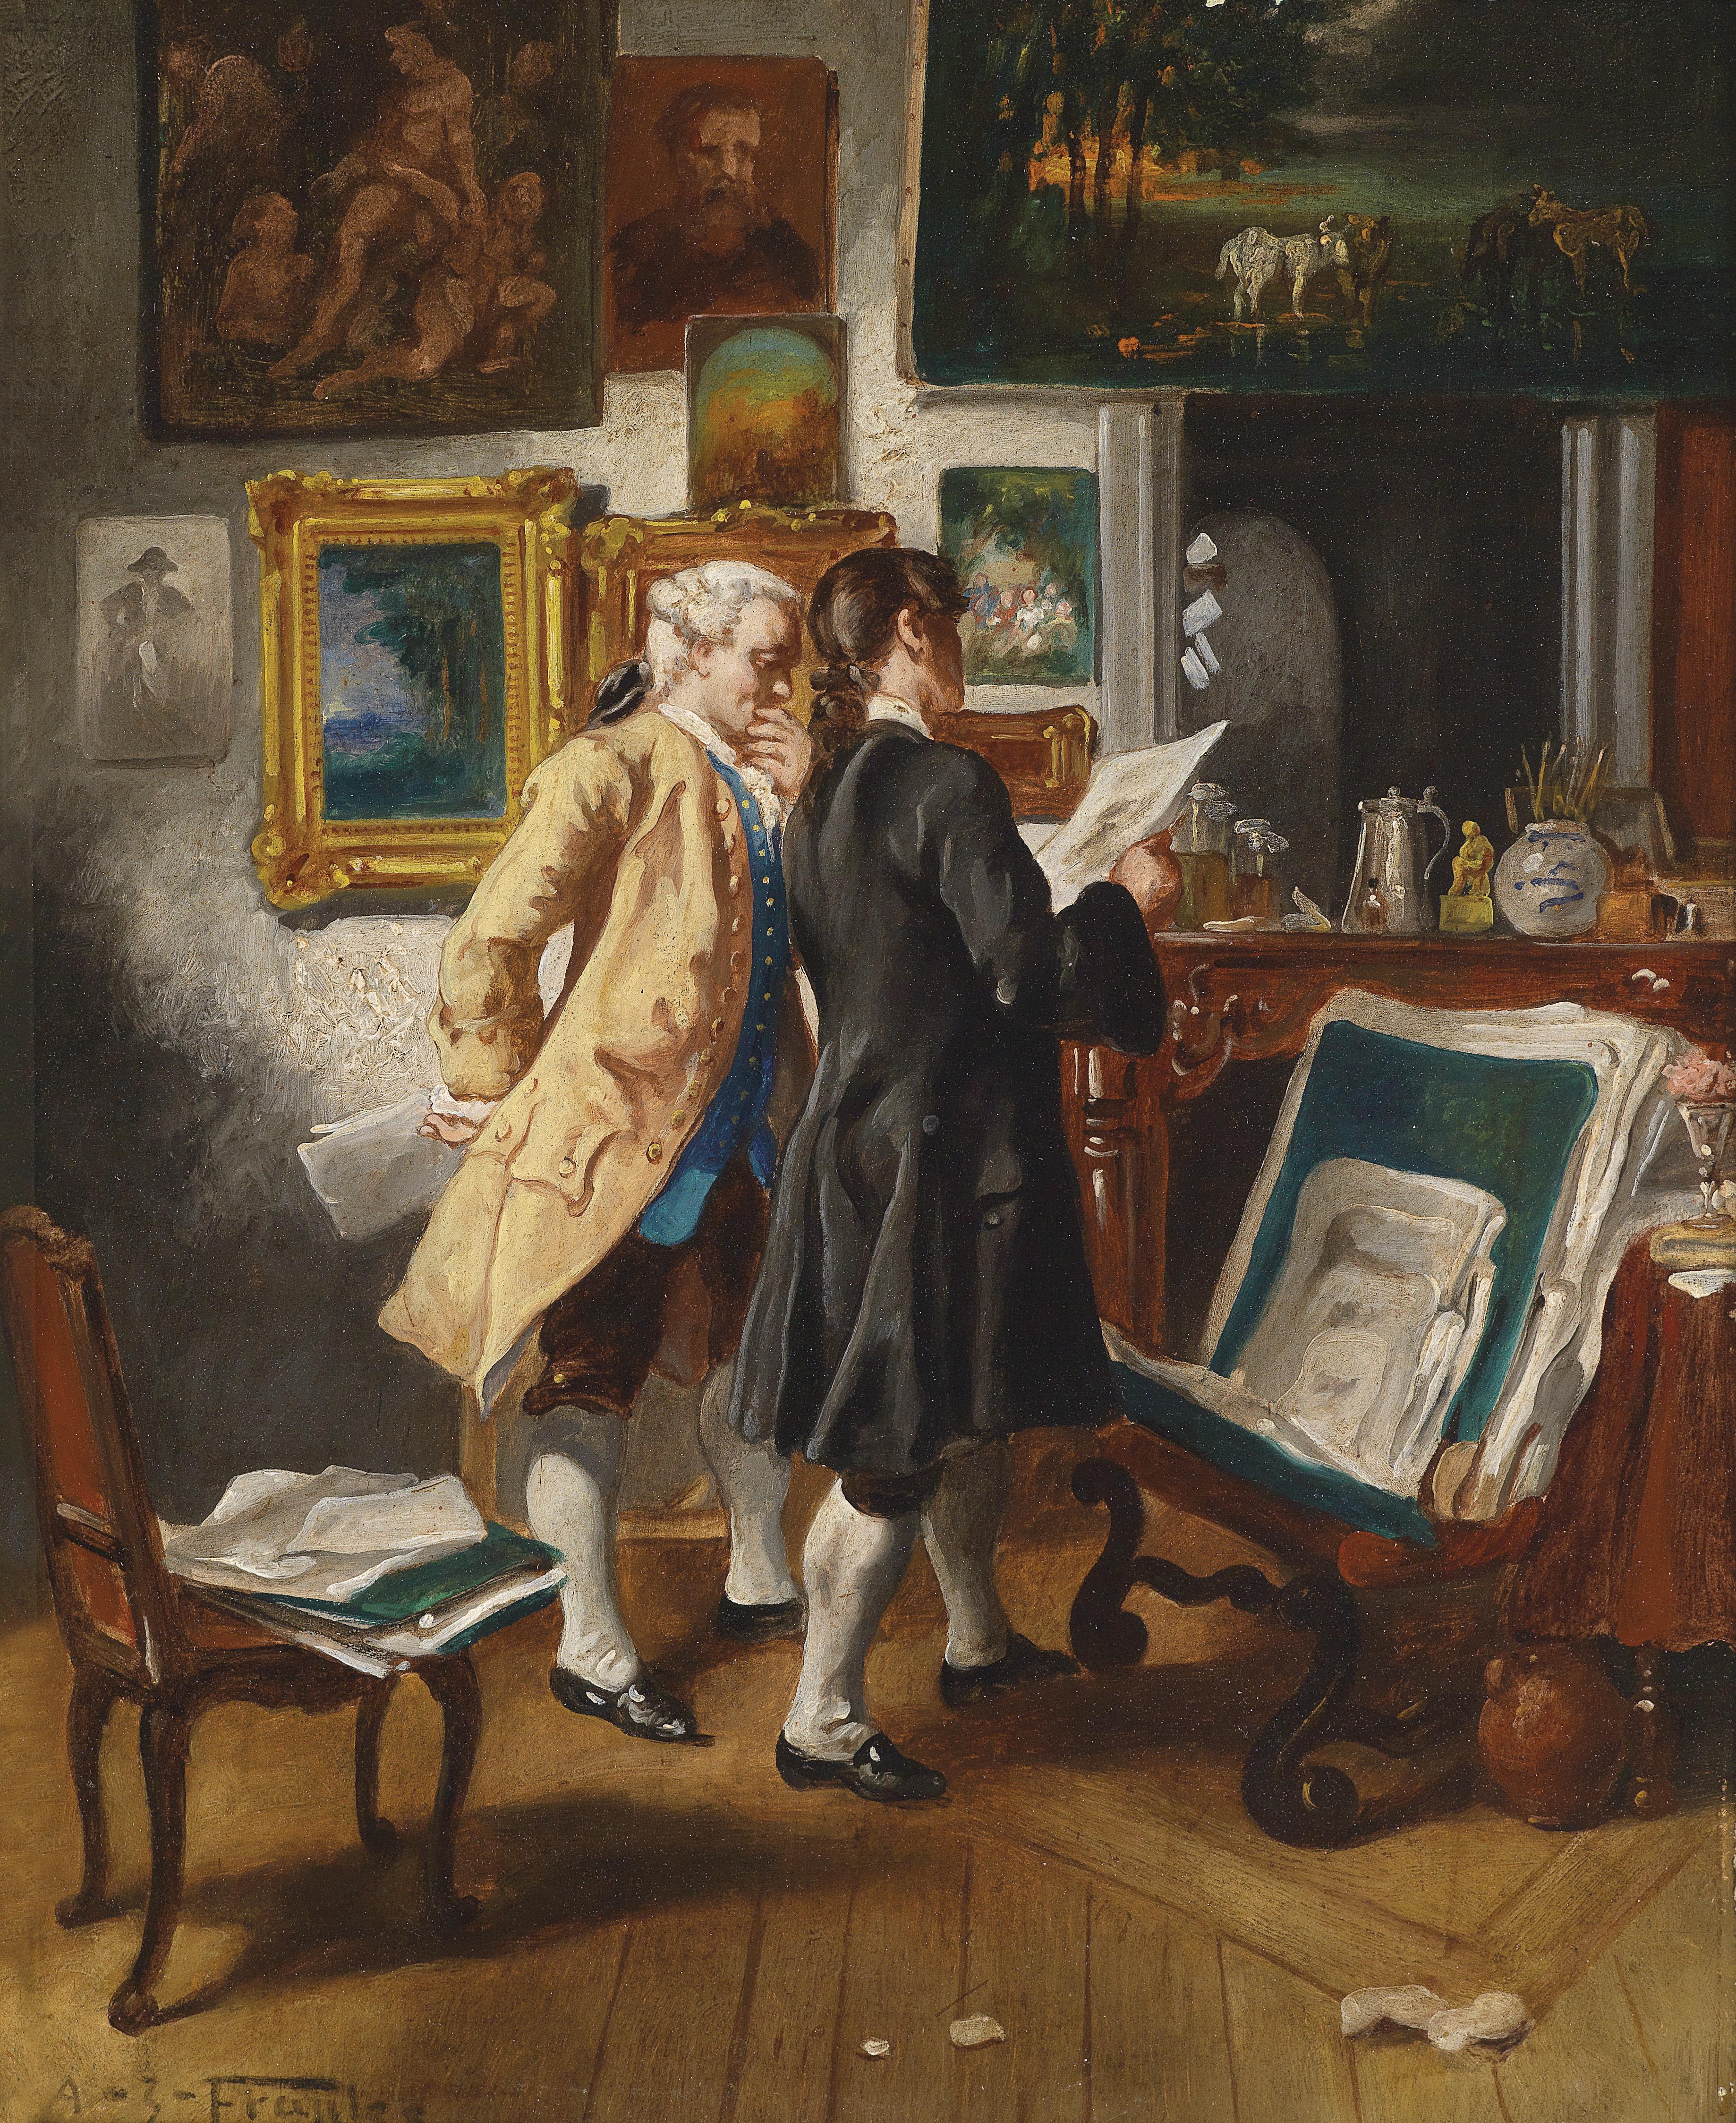 File:Albert Josef Franke Beim Antiquit?tenh?ndler.jpg - Wikimedia ...